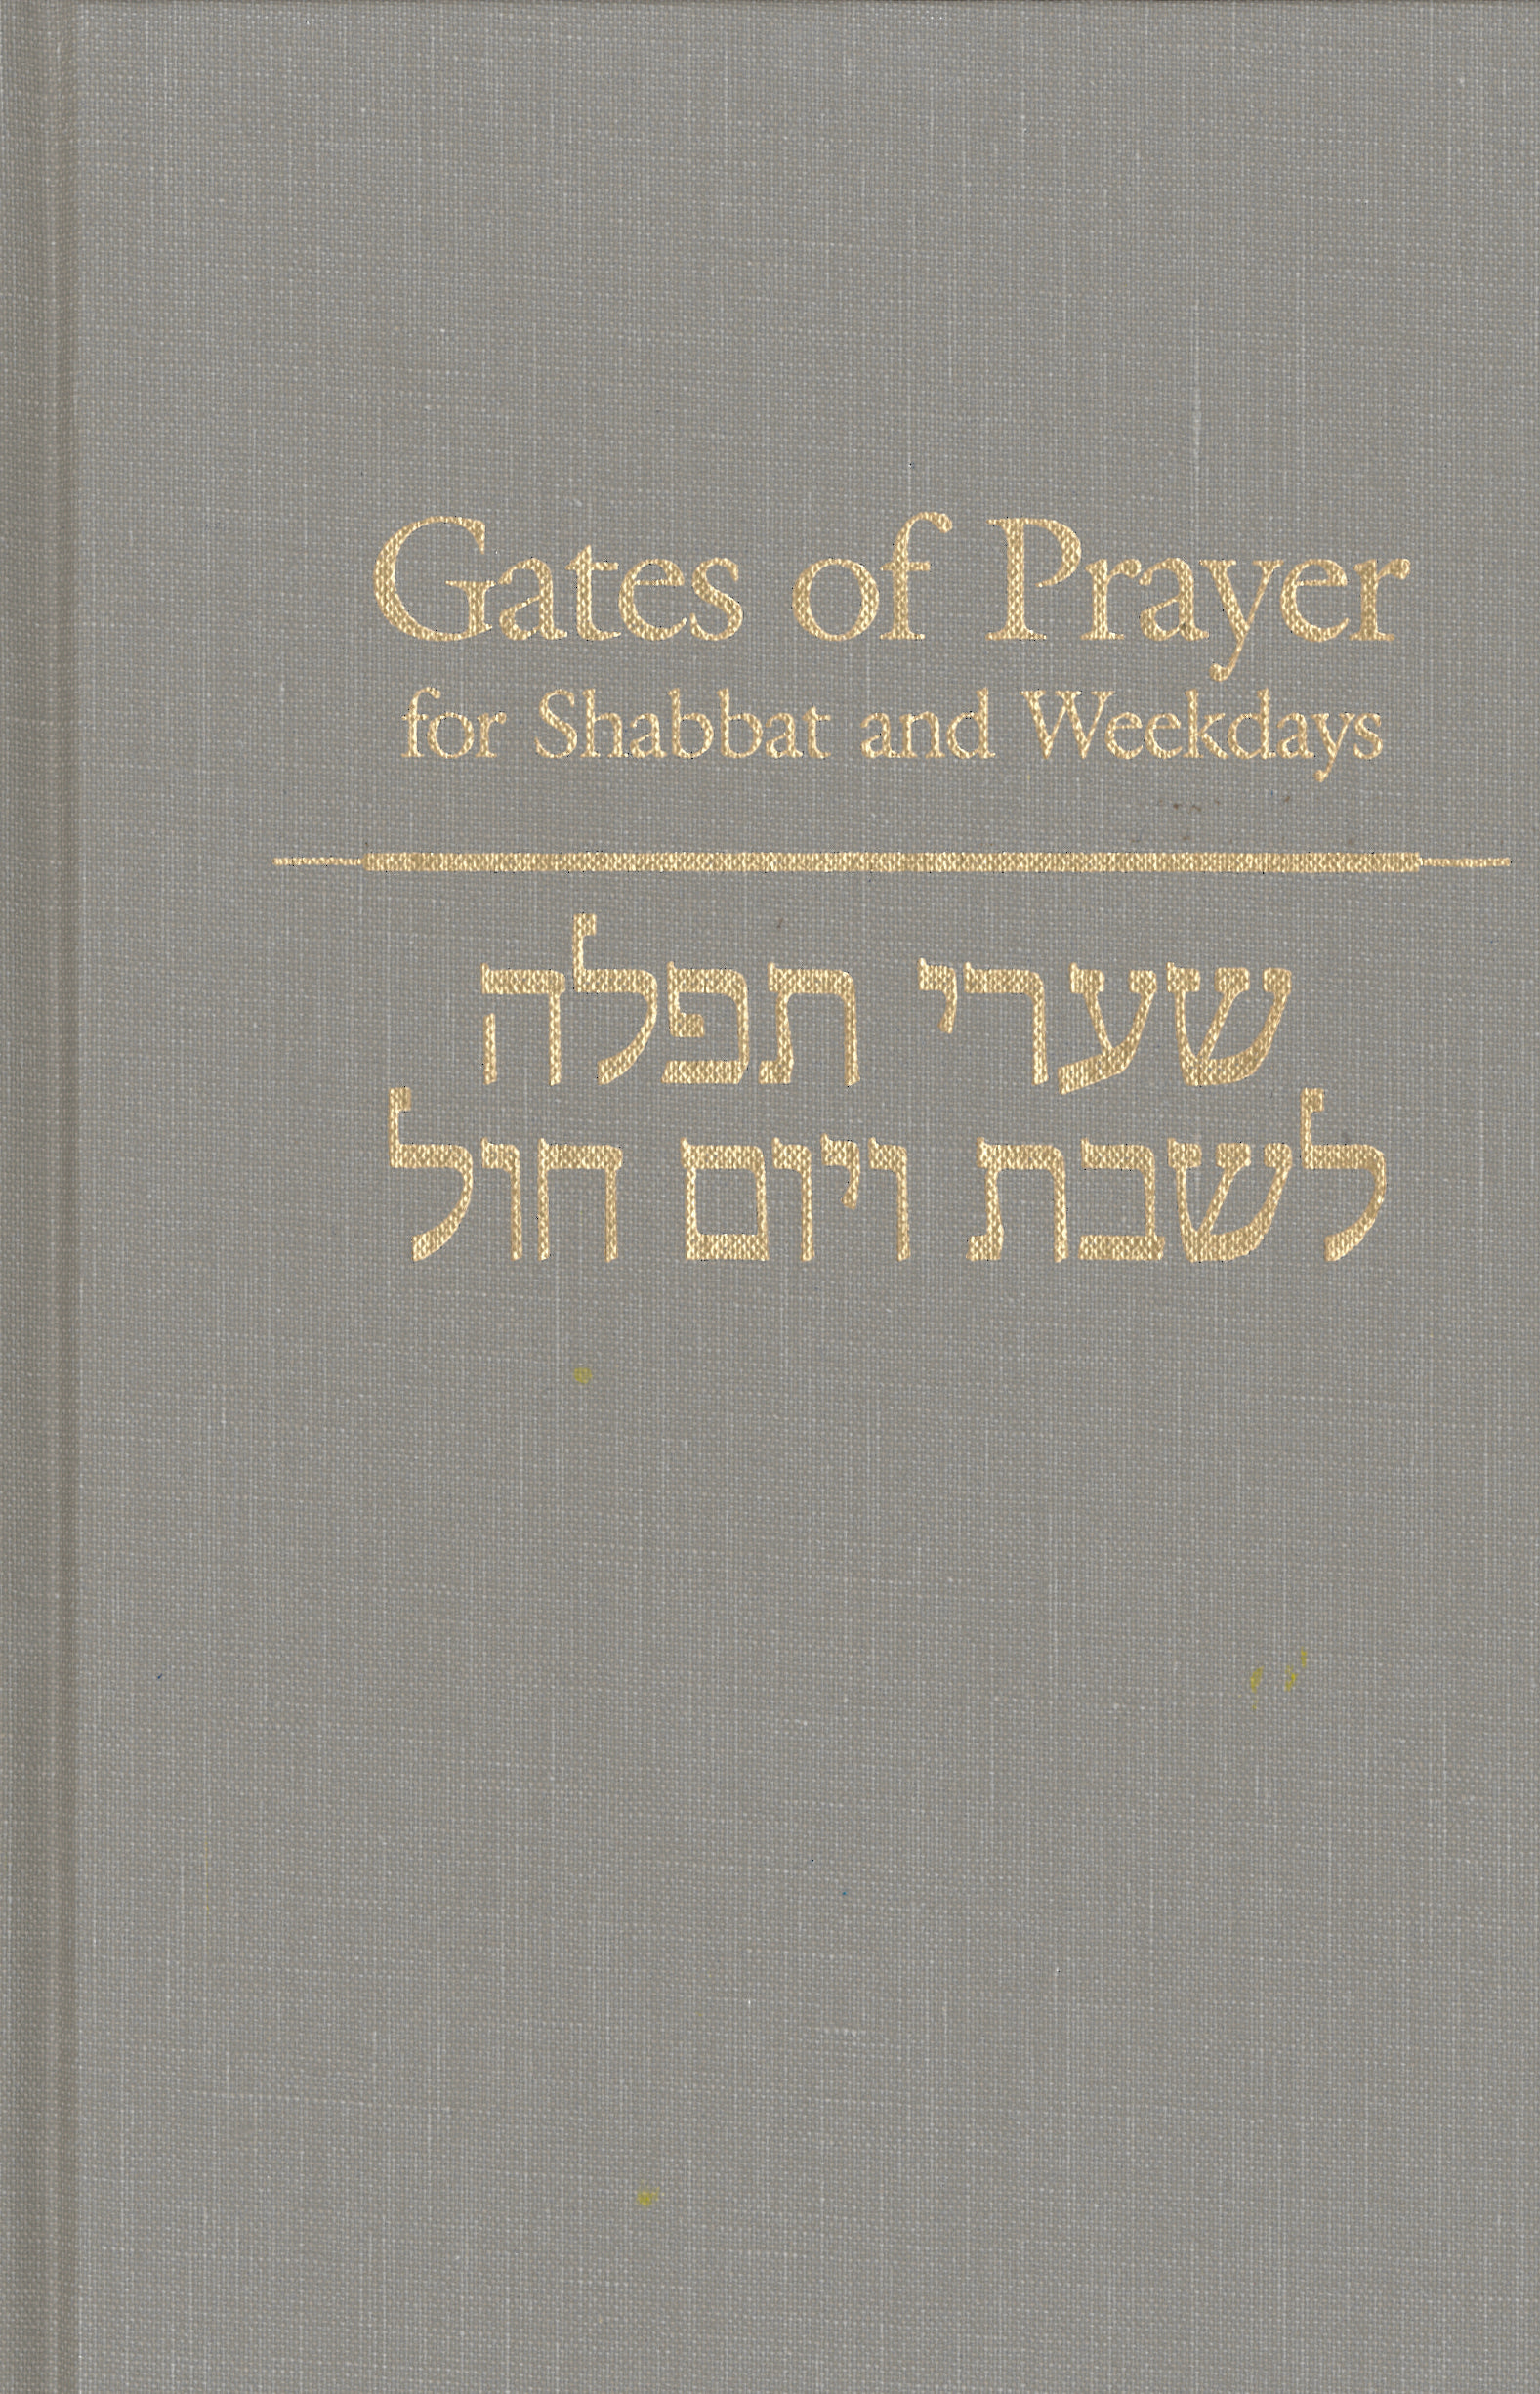 Gates of Prayer for Shabbat and Weekdays - English-opening,